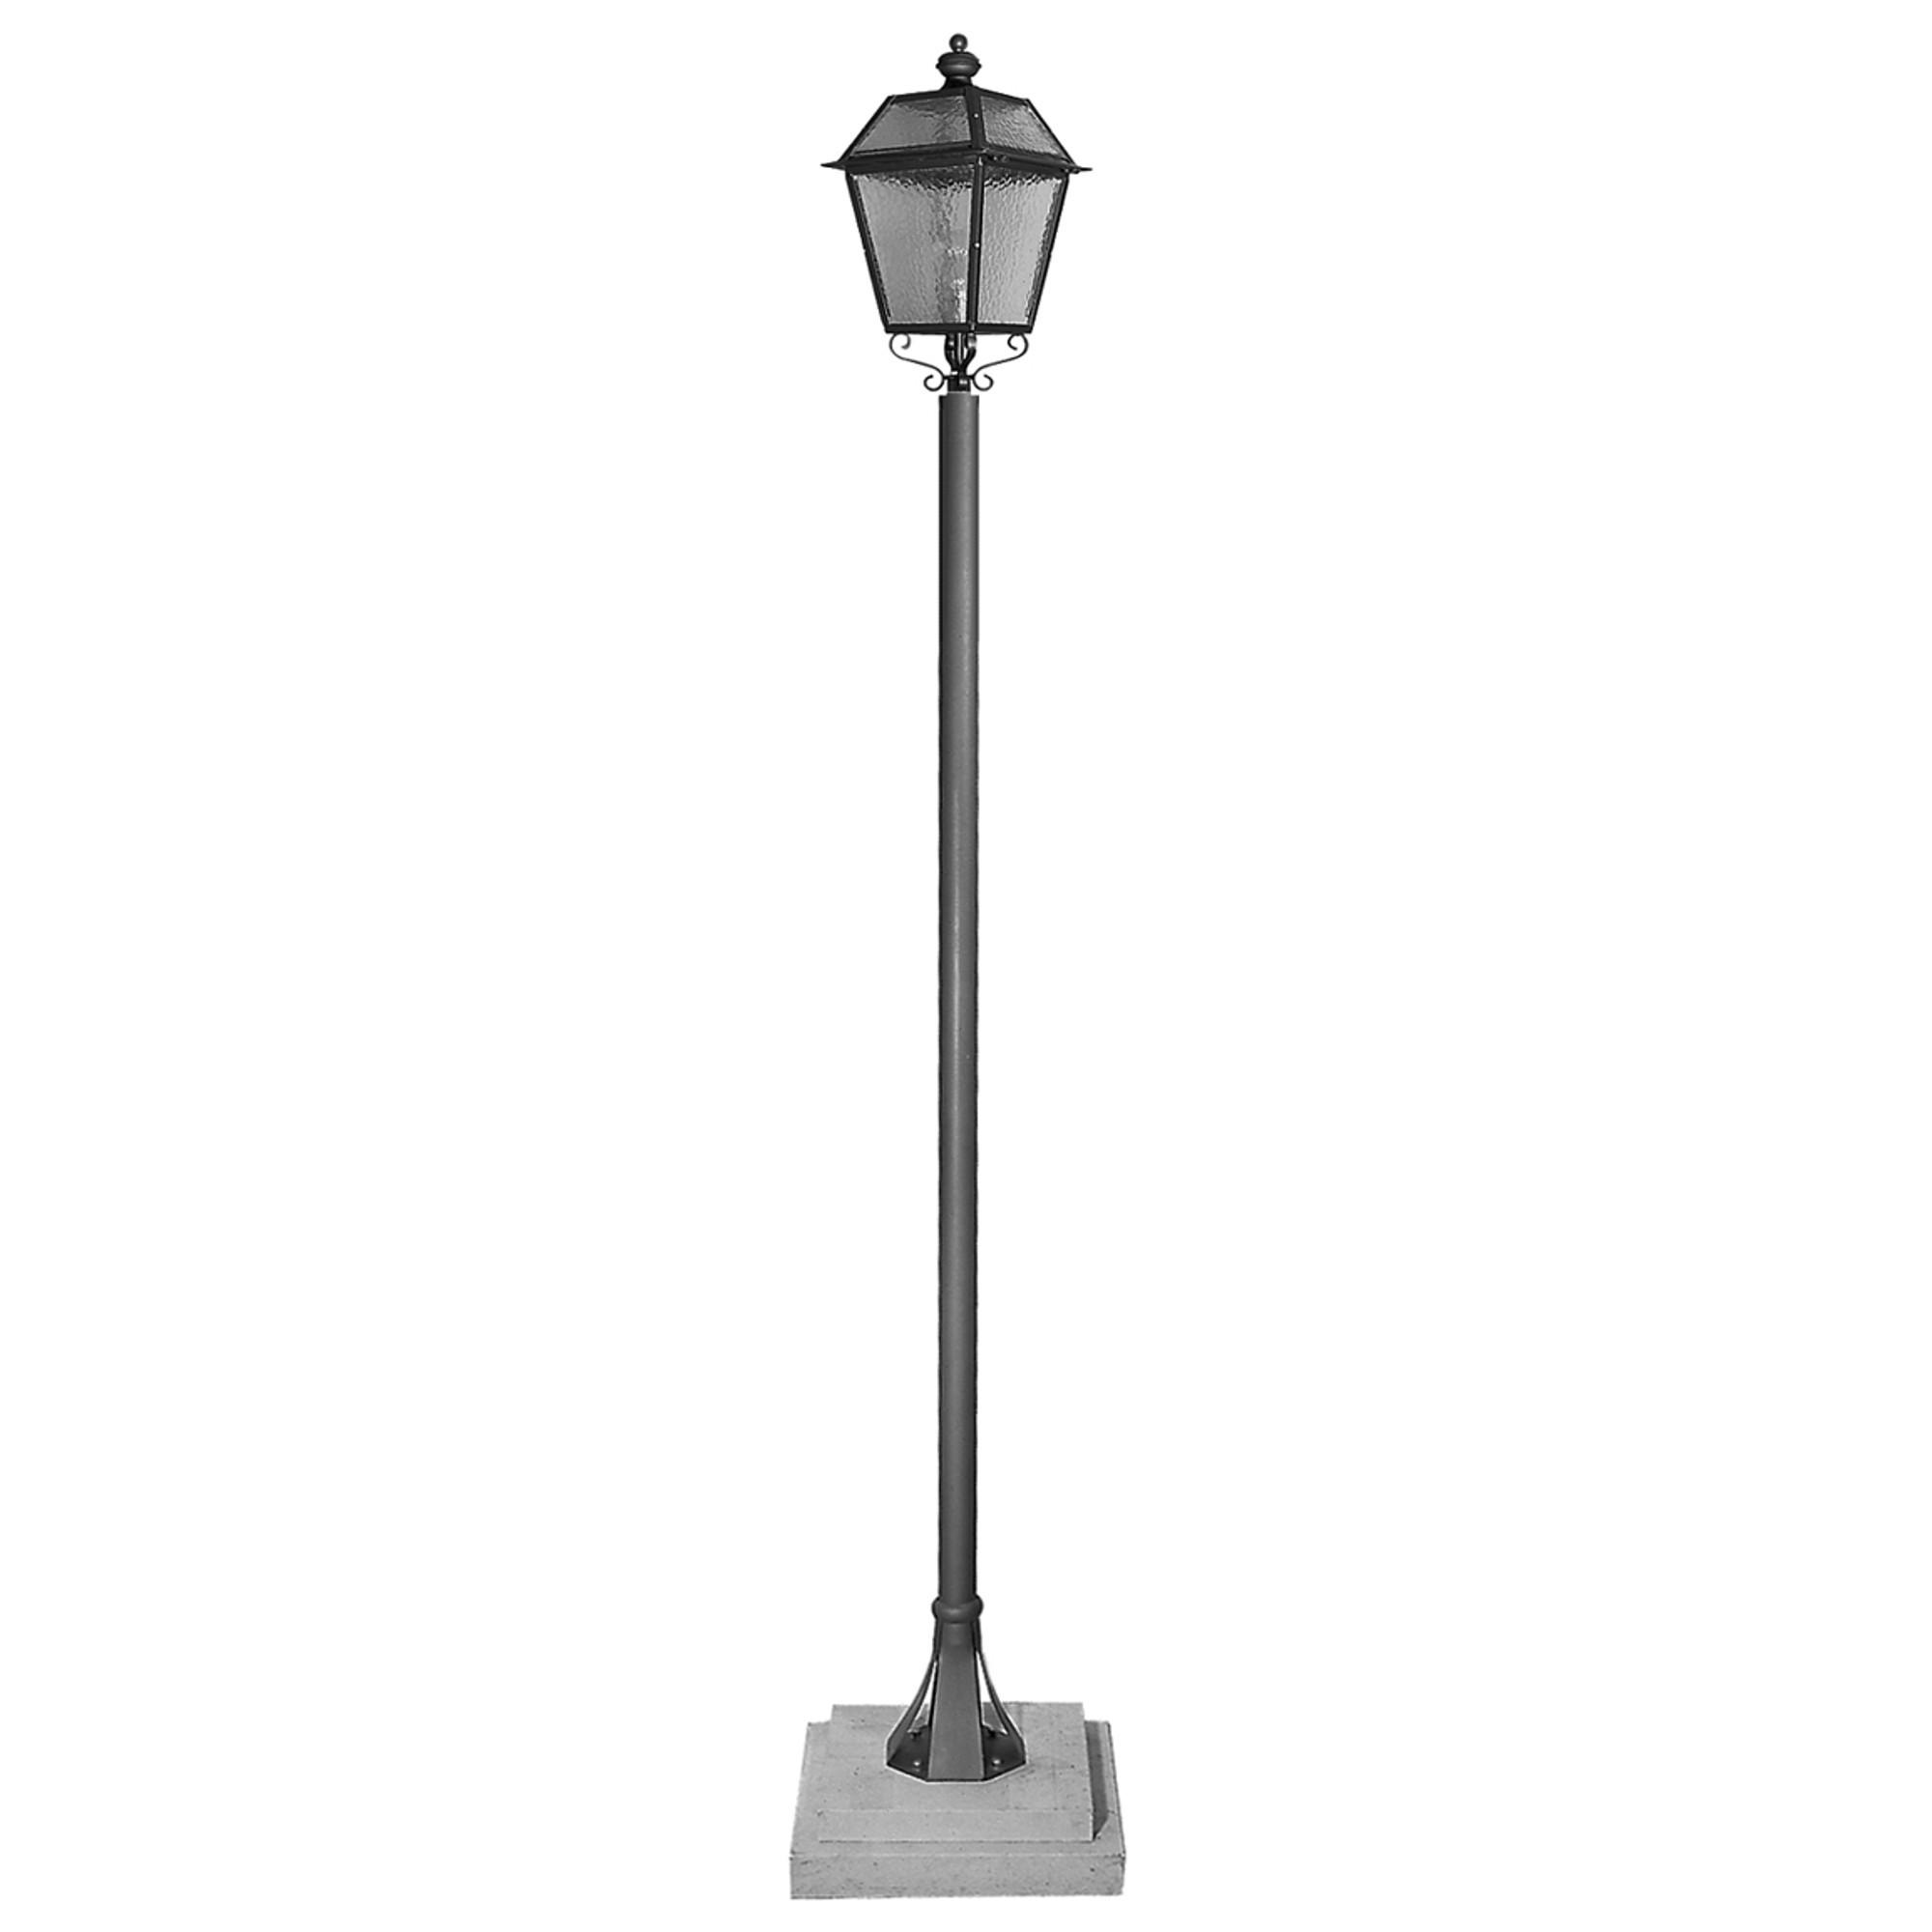 FLORENTINE STREET LAMP, by GAIA